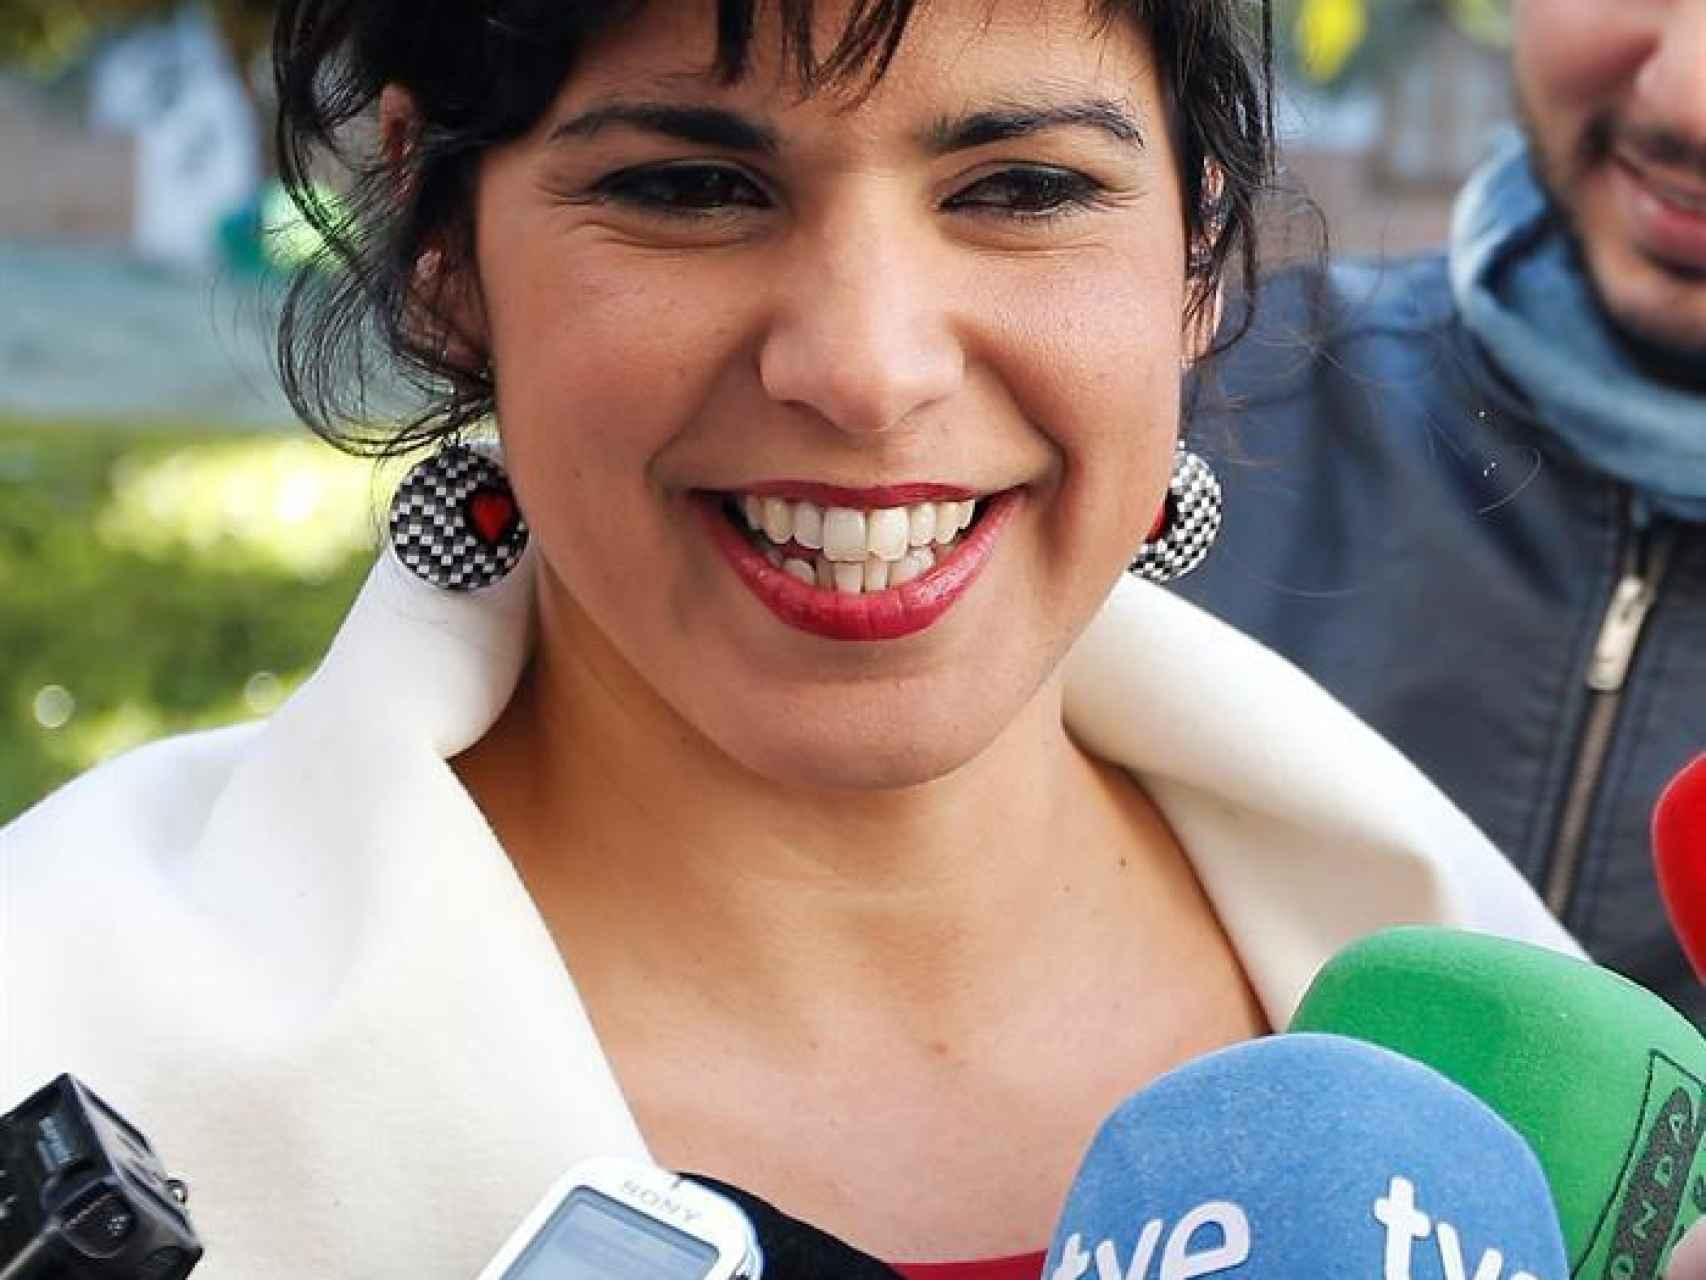 Teresa Rodríguez atiende a los medios la pasada semana en Sevilla - Teresa-Rodriguez-atiende-semana-Sevilla_96000452_455870_1706x1280